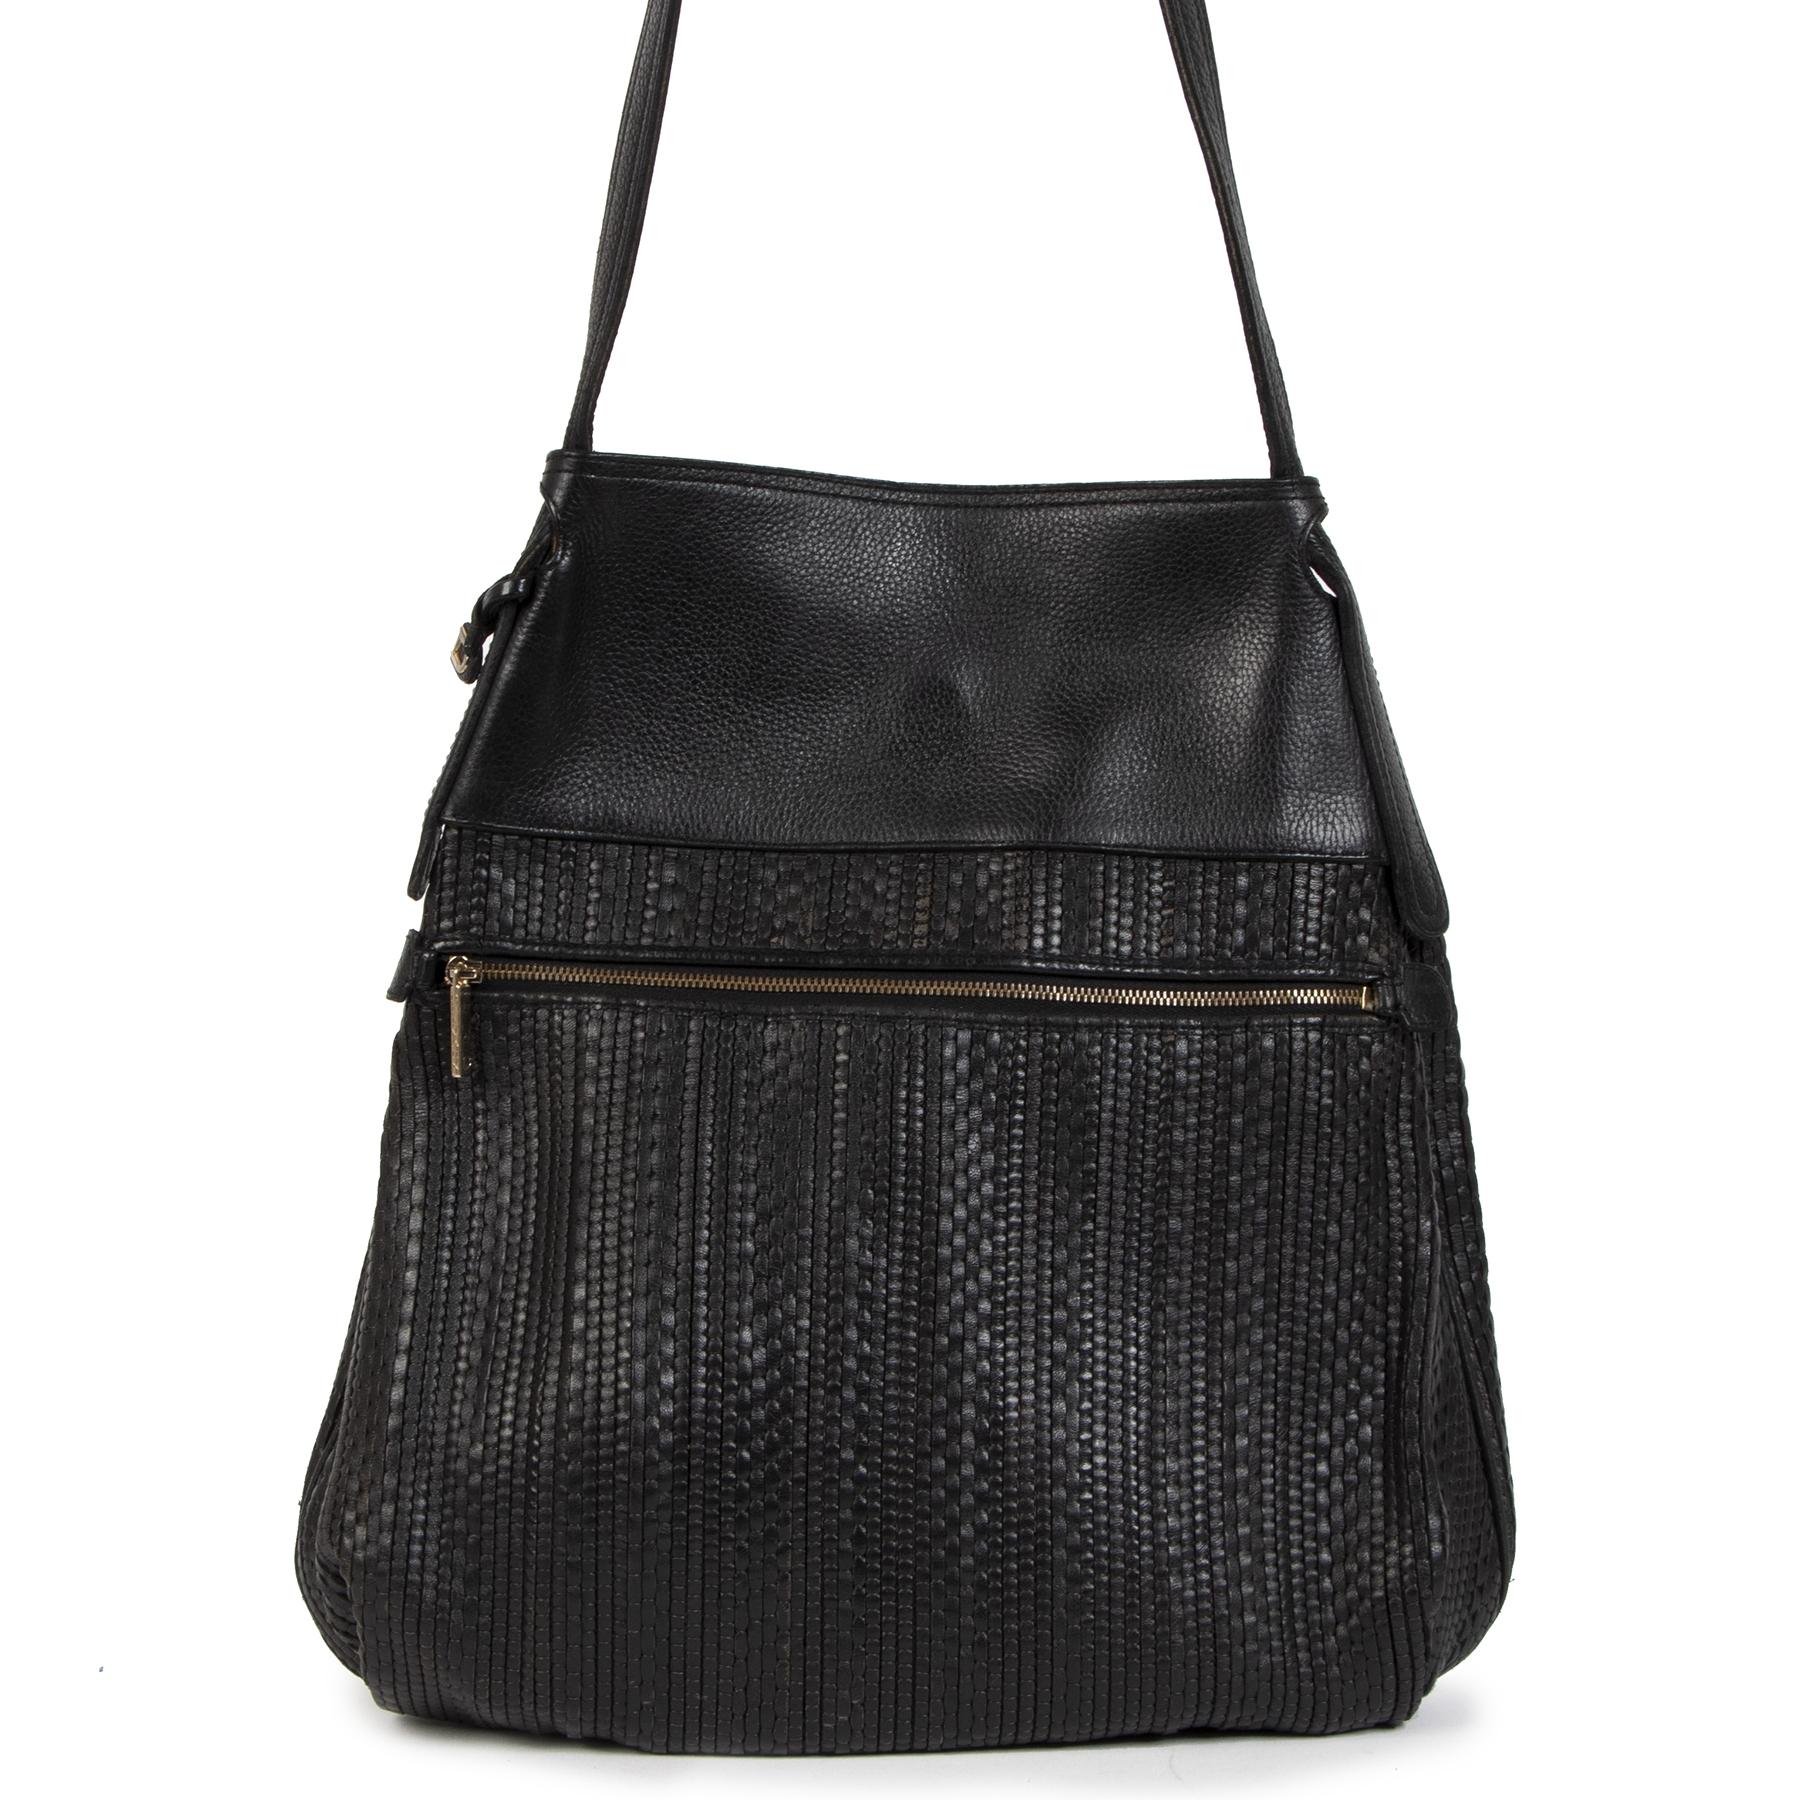 Authentic secondhand Delvaux Blue Toile De Cuir Faust Bag designer bags designer brands fashion luxury vintage webshop safe secure online shopping worldwide shipping delivery